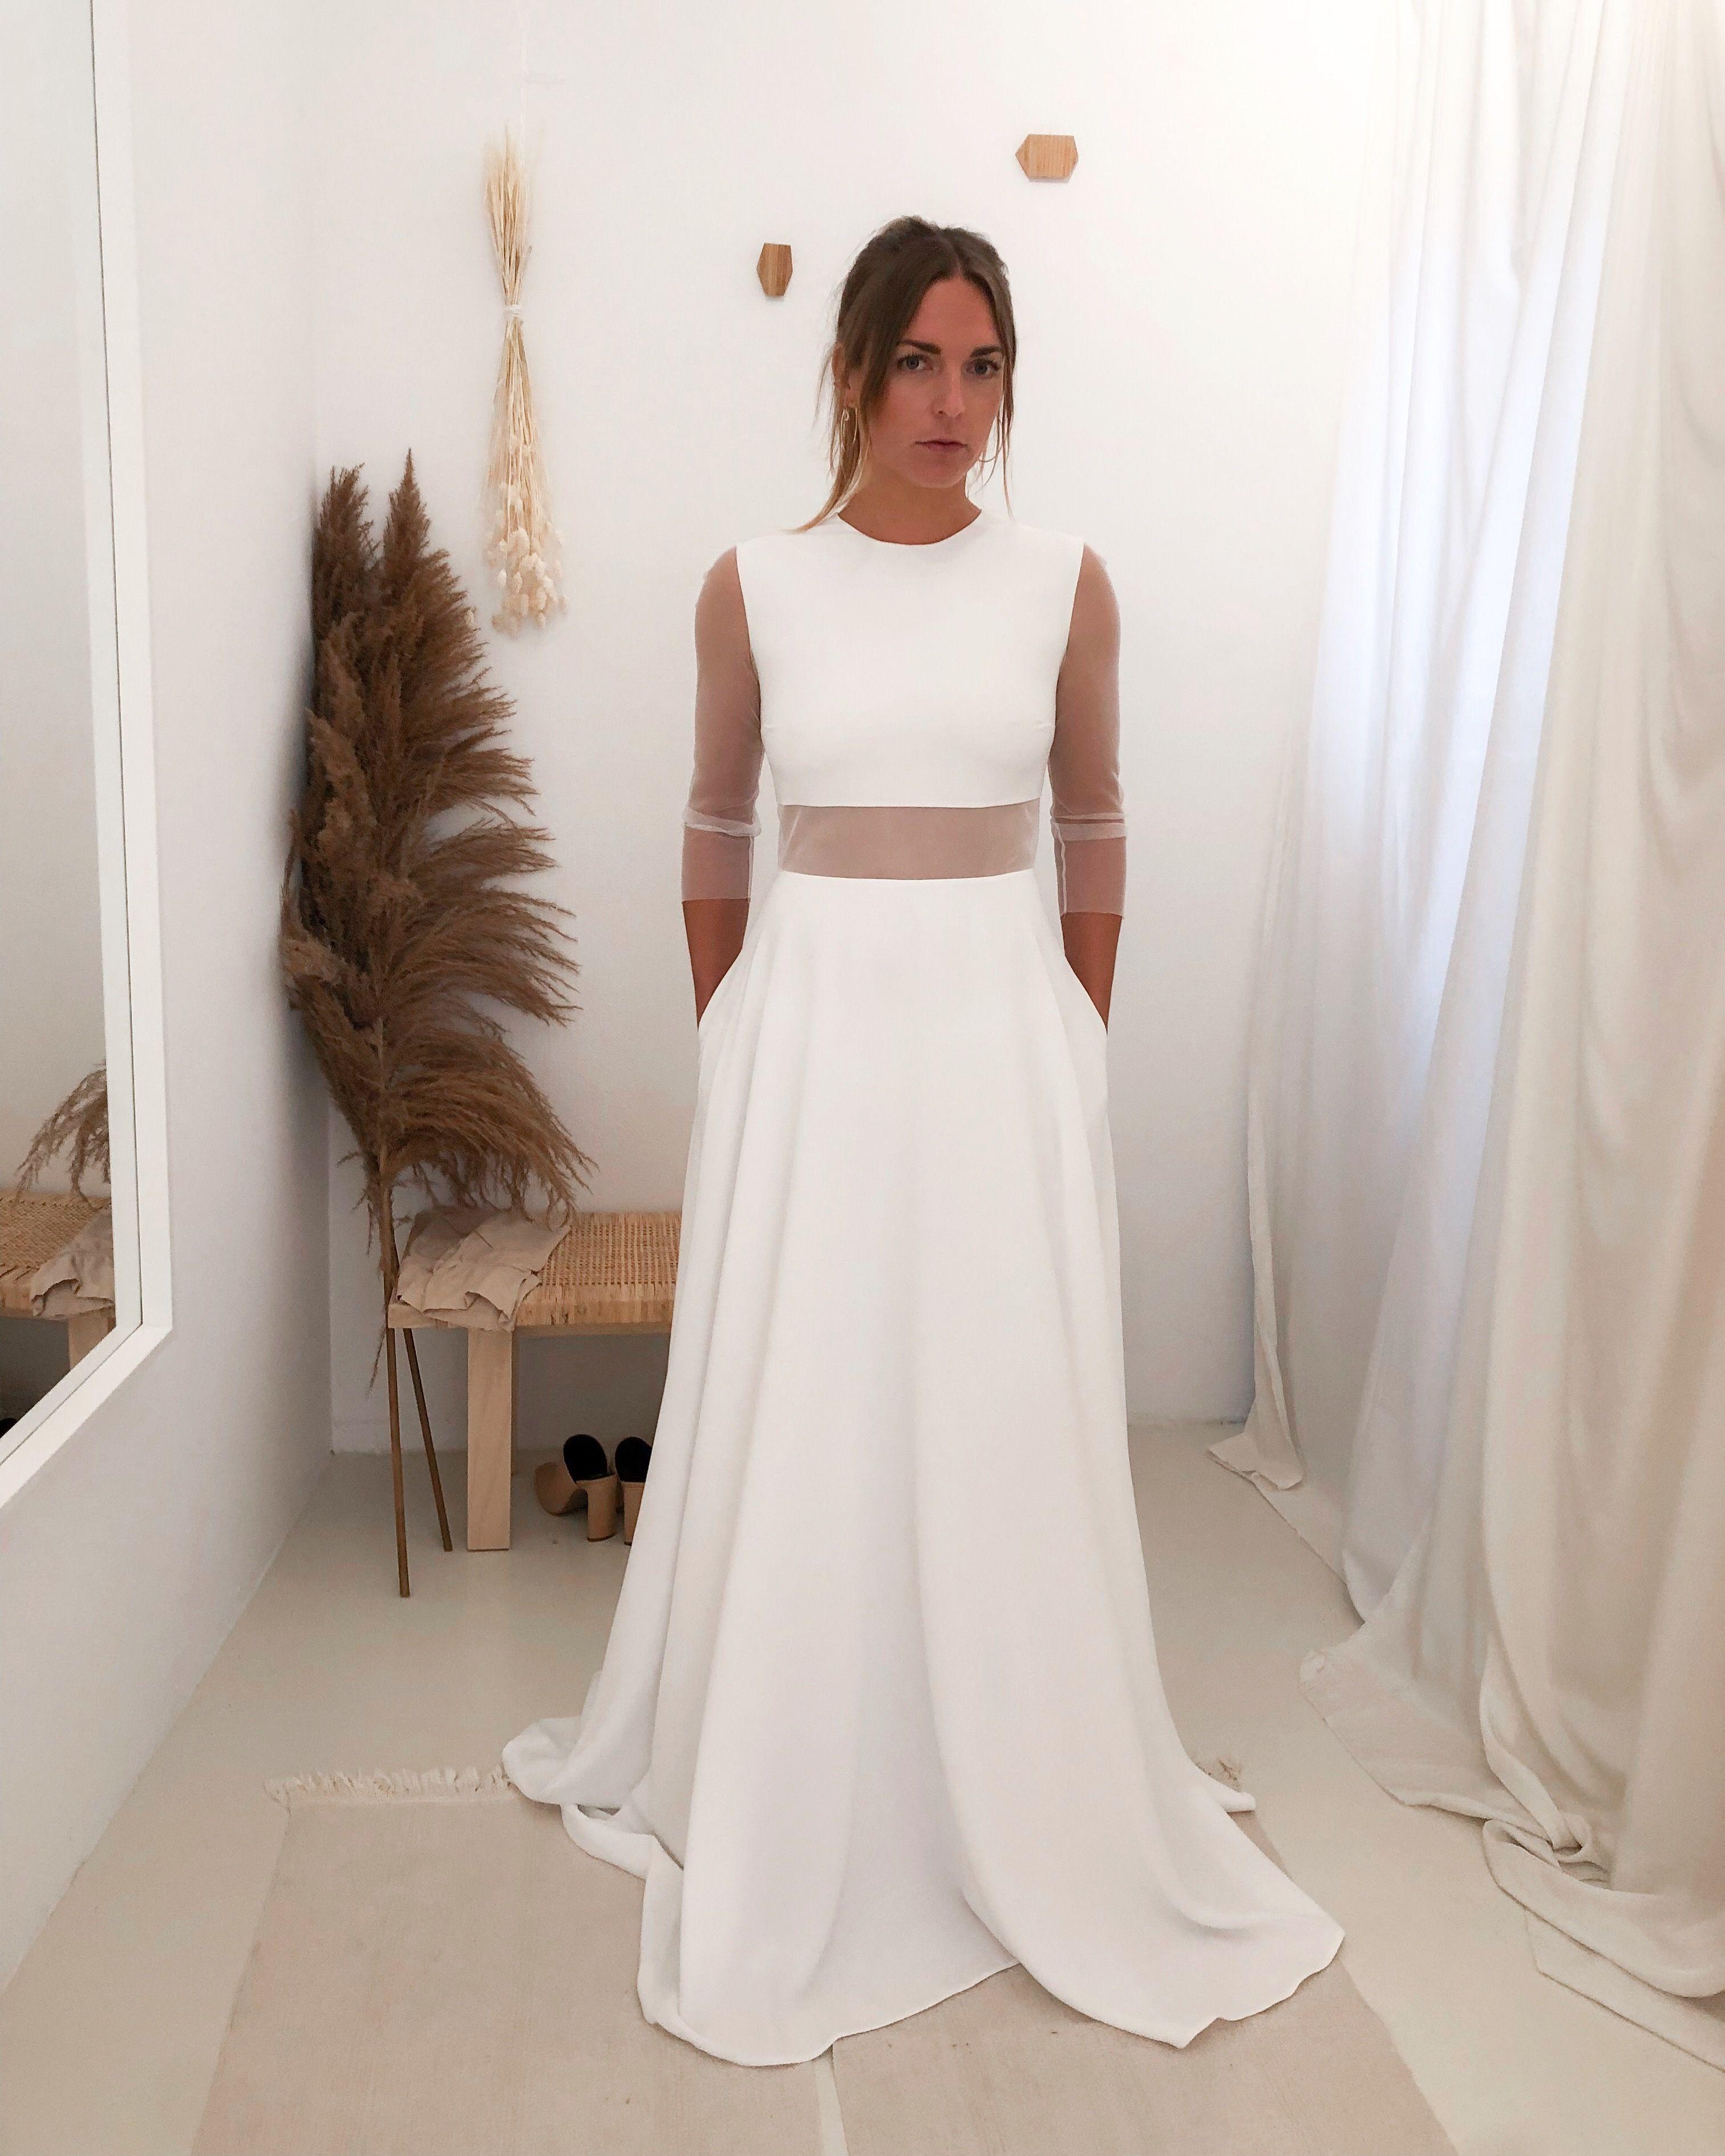 BON BRIDÉ - All The Feels Bridal Store  Hochzeitskleid modern